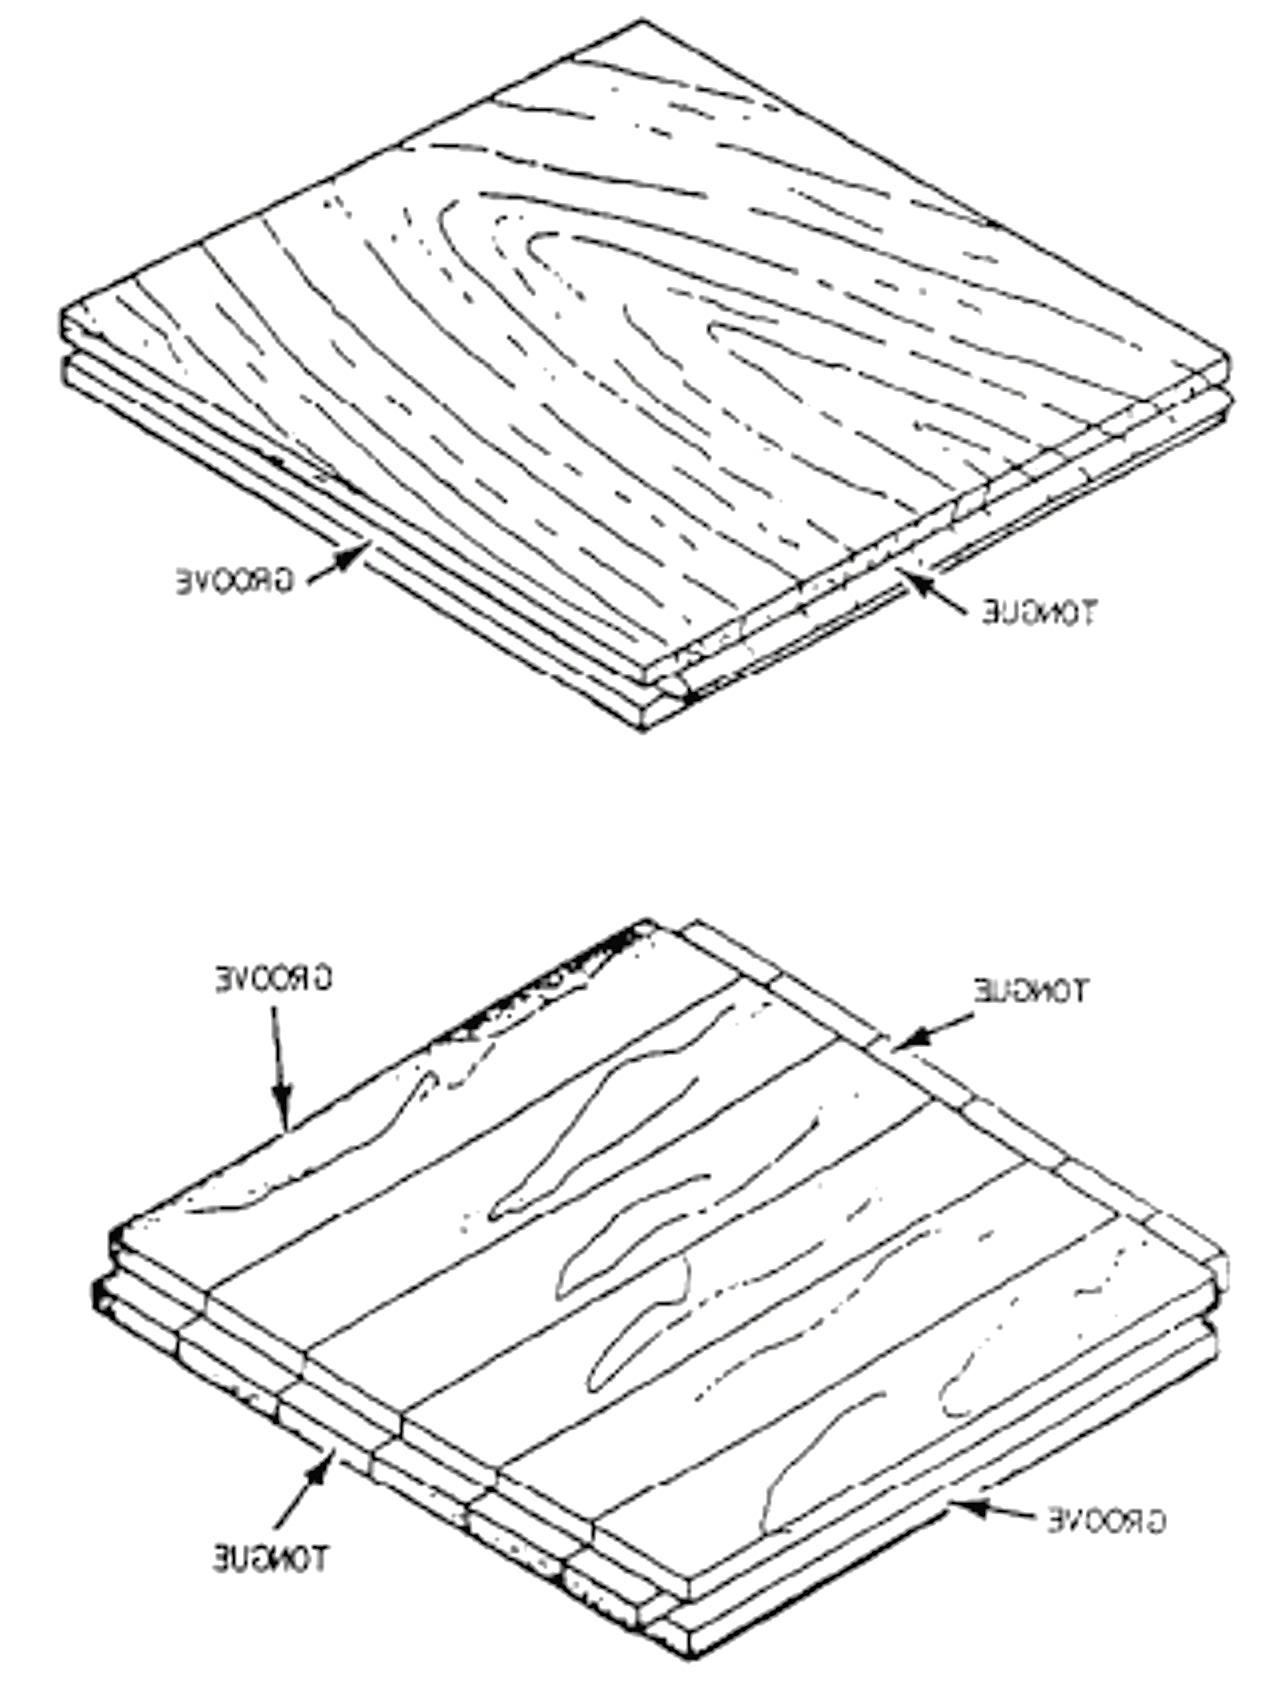 1270x1689 Wood Flooring Drawing Diverting Remedygolf.us